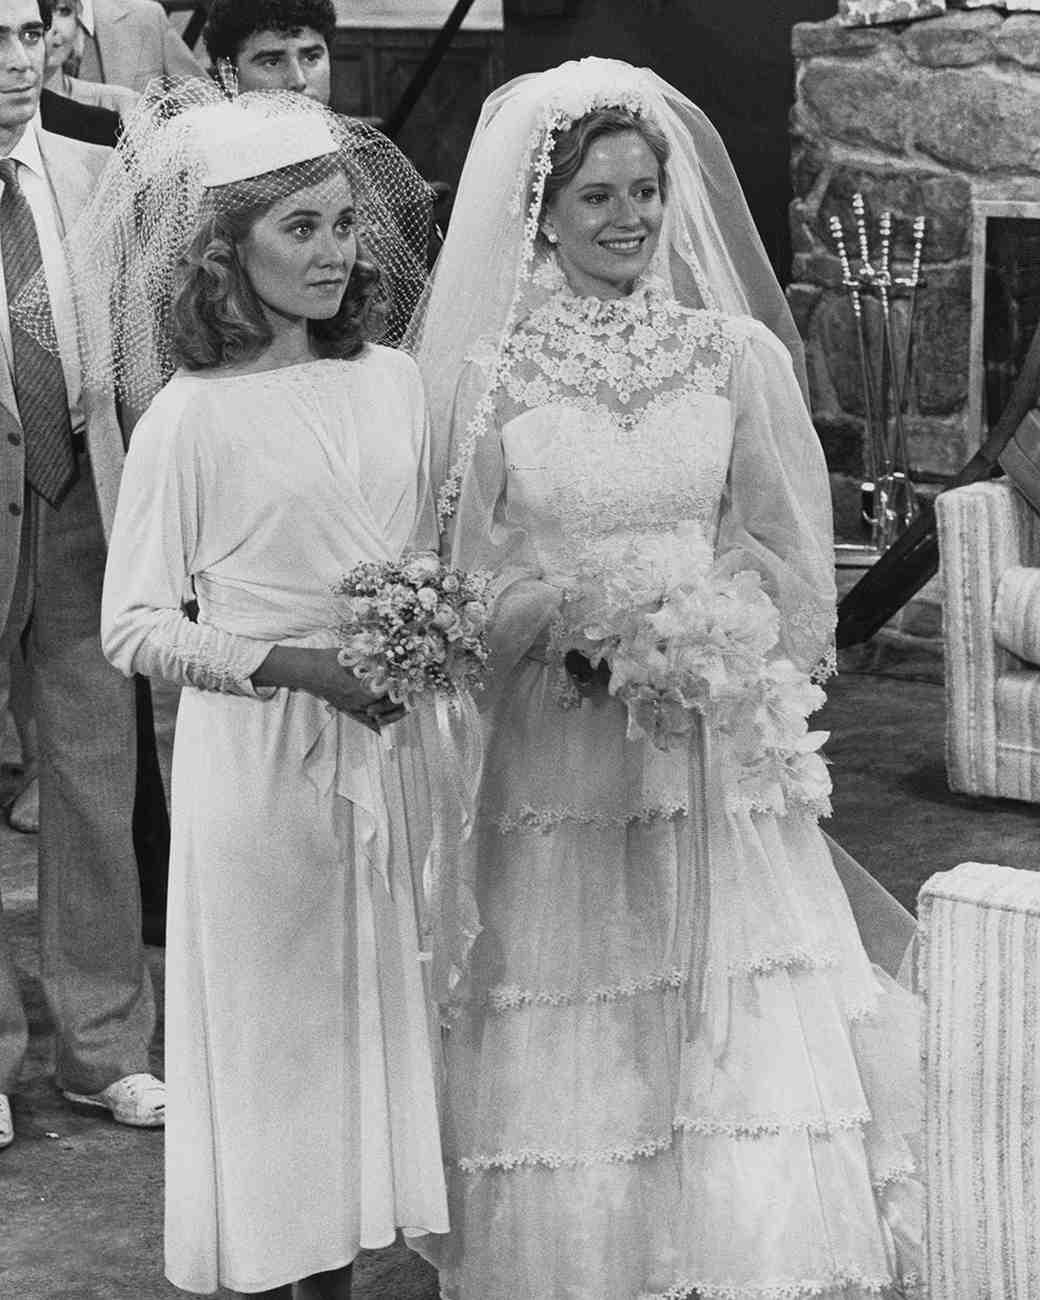 movie-wedding-dresses-the-brady-girls-get-married-maureen-mccormick-eve-plumb-0316.jpg